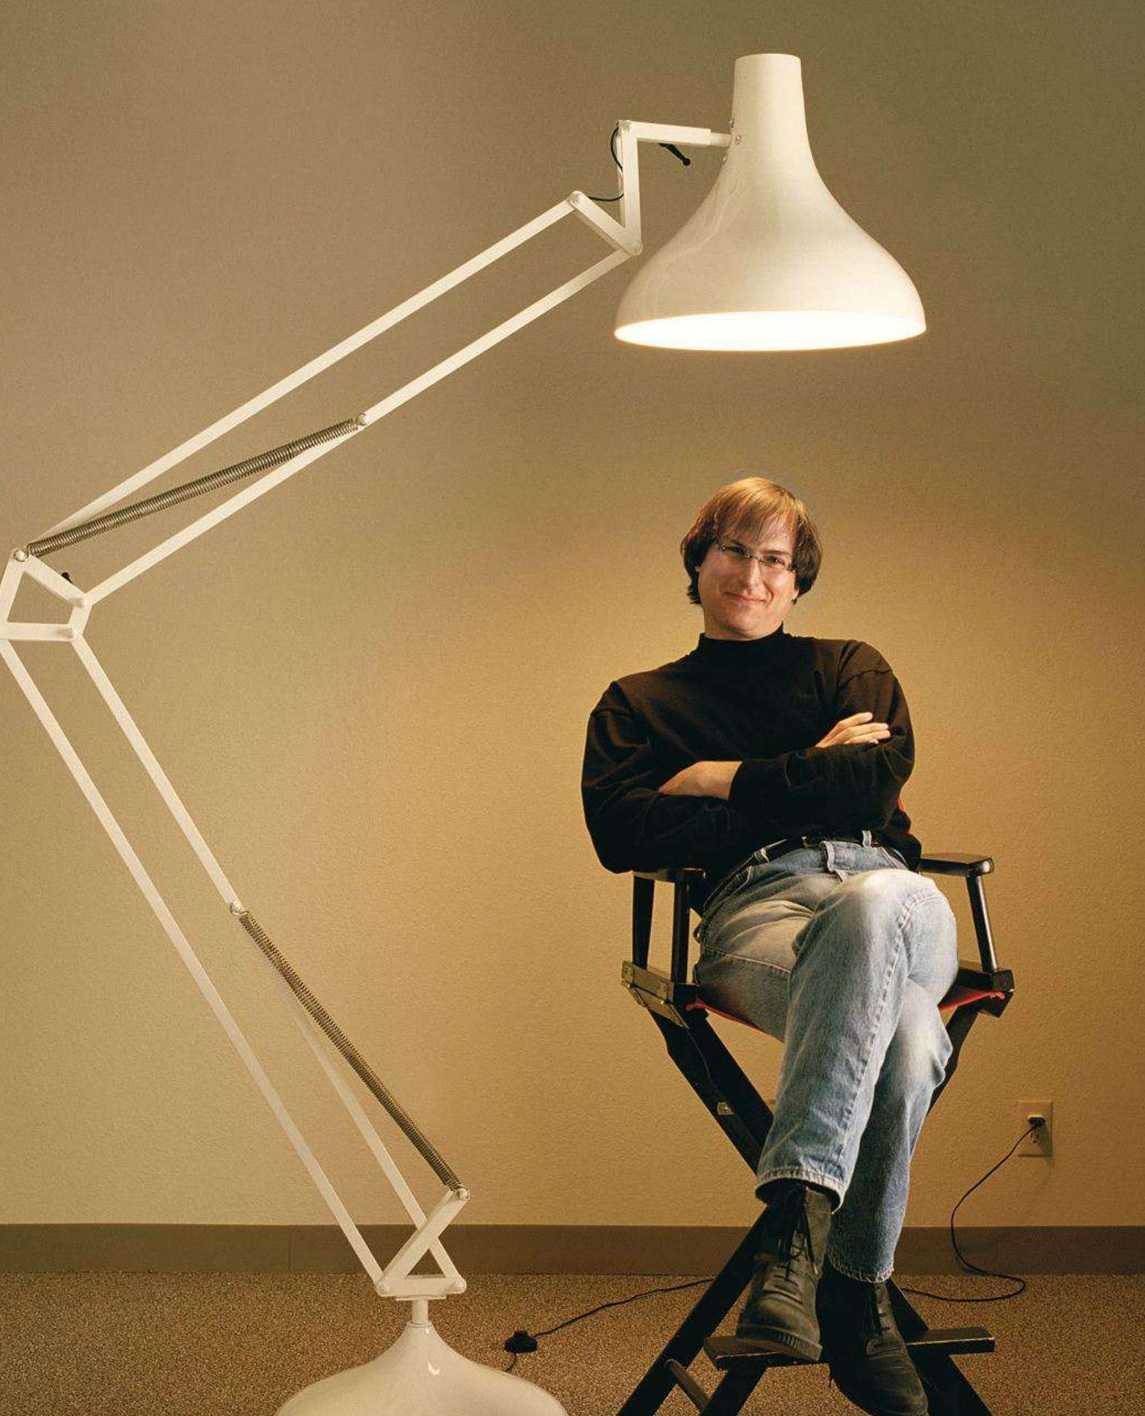 Steve Jobs Pixar